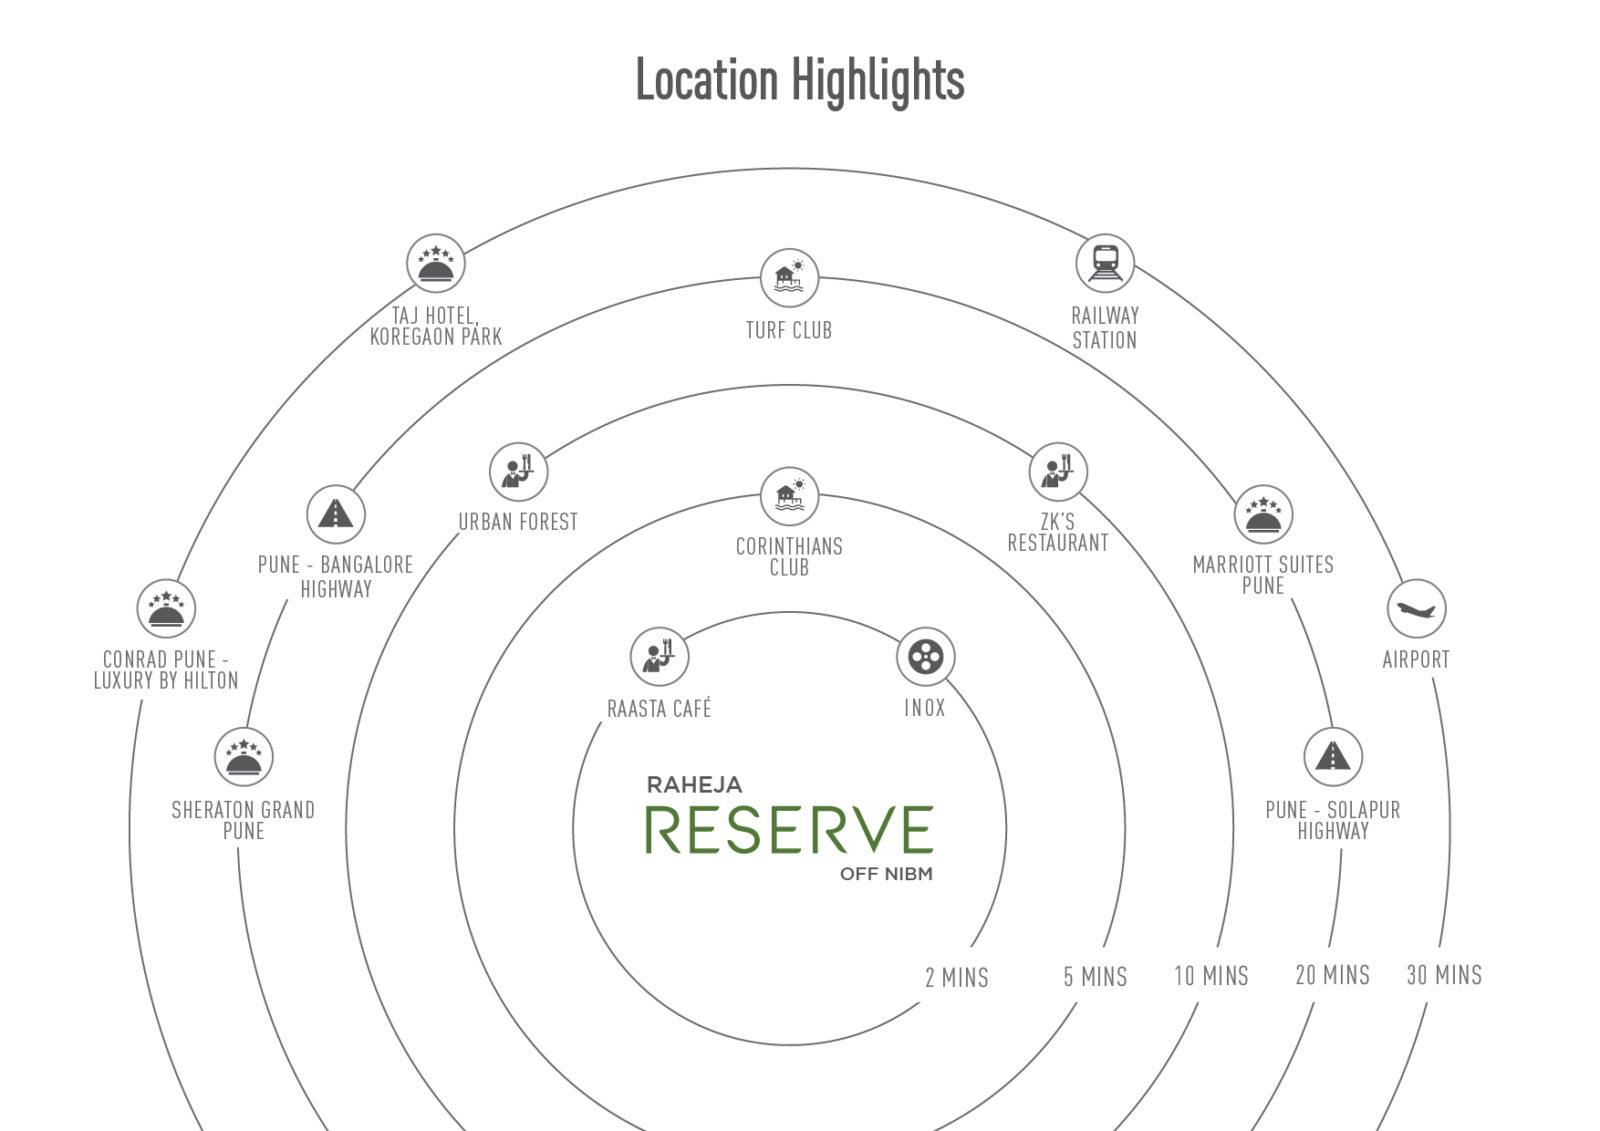 Raheja Reserve Location Map